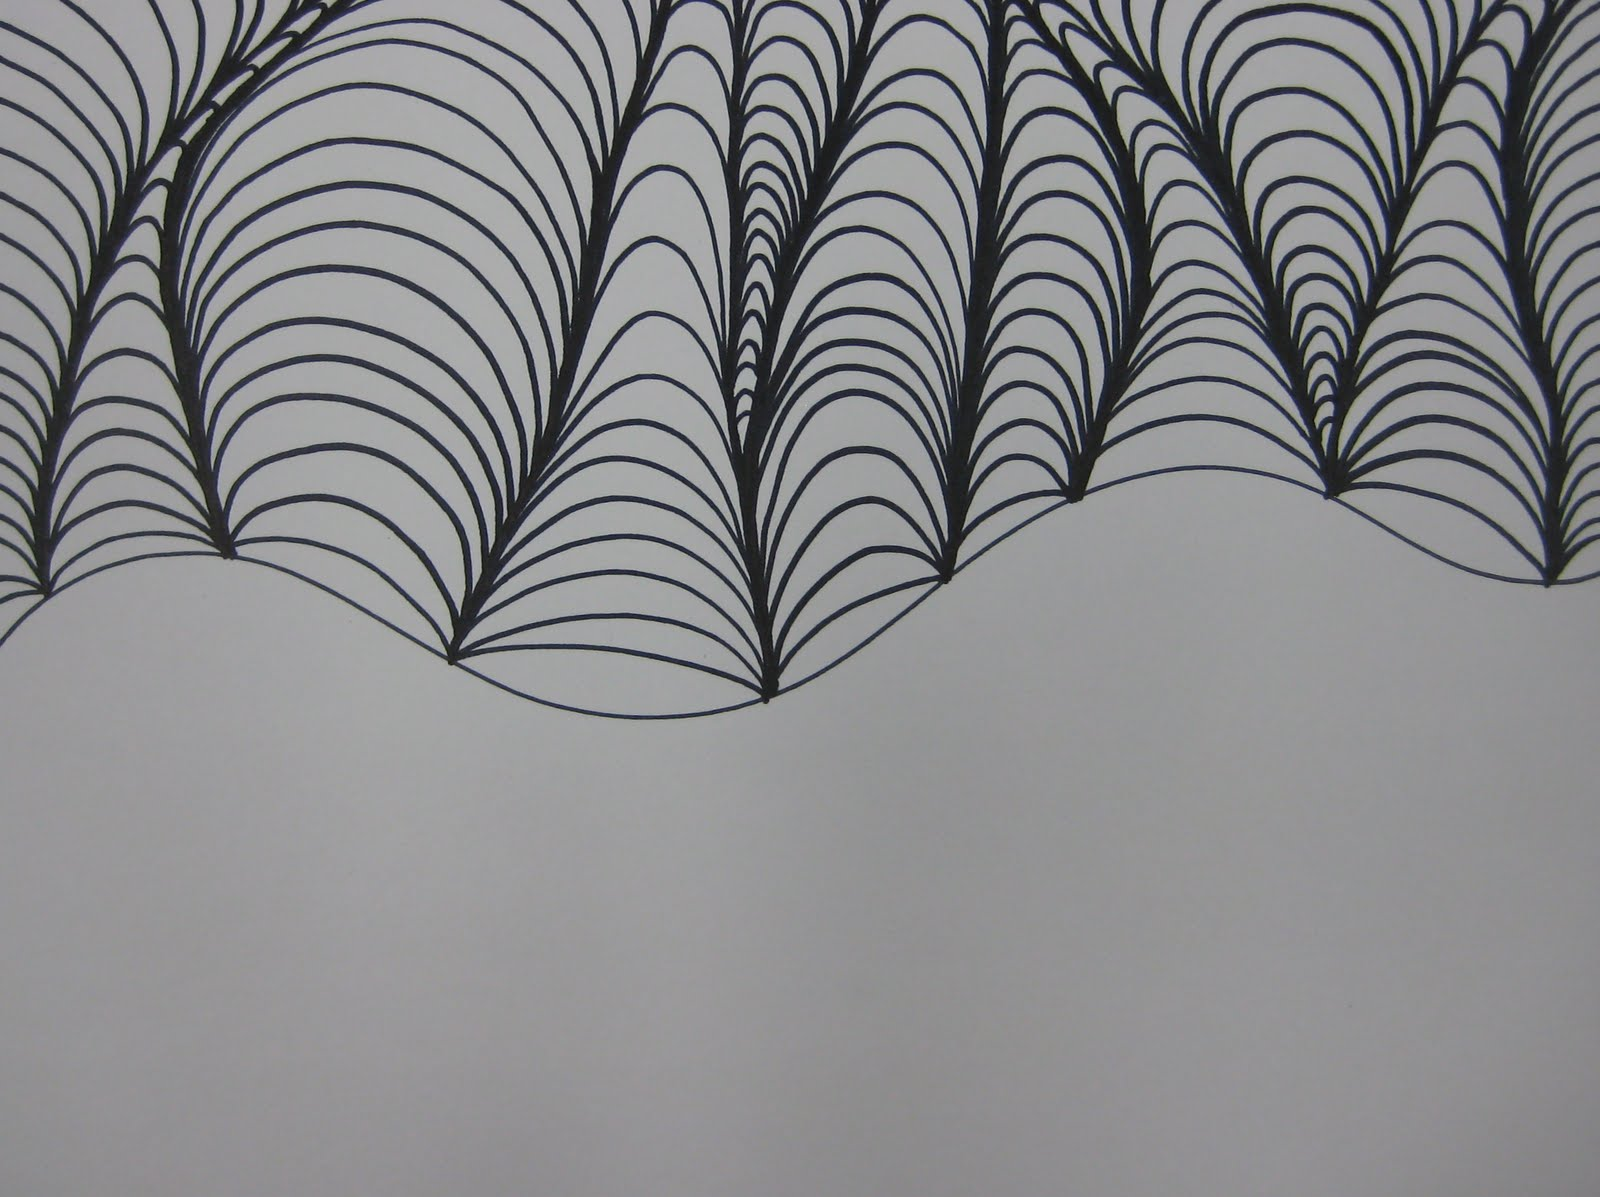 Teachkidsart Line Designs With Shading